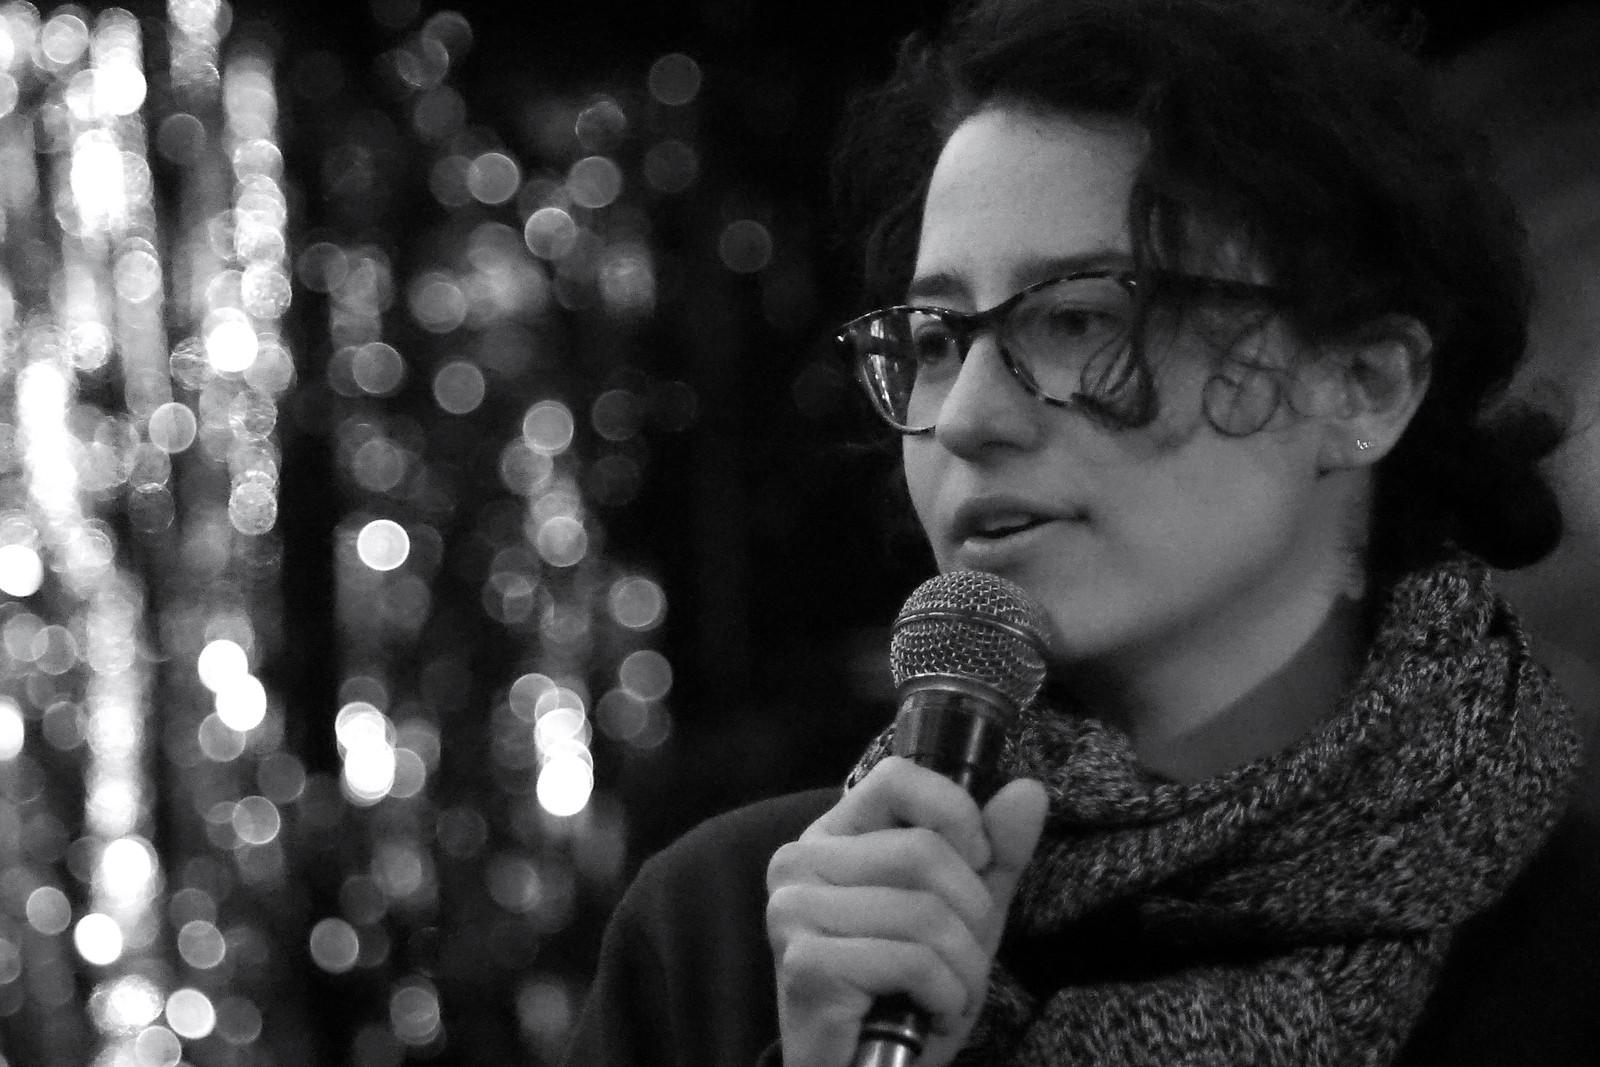 Ilana Glazer, standup comic and co-star / co-creator of Broad City